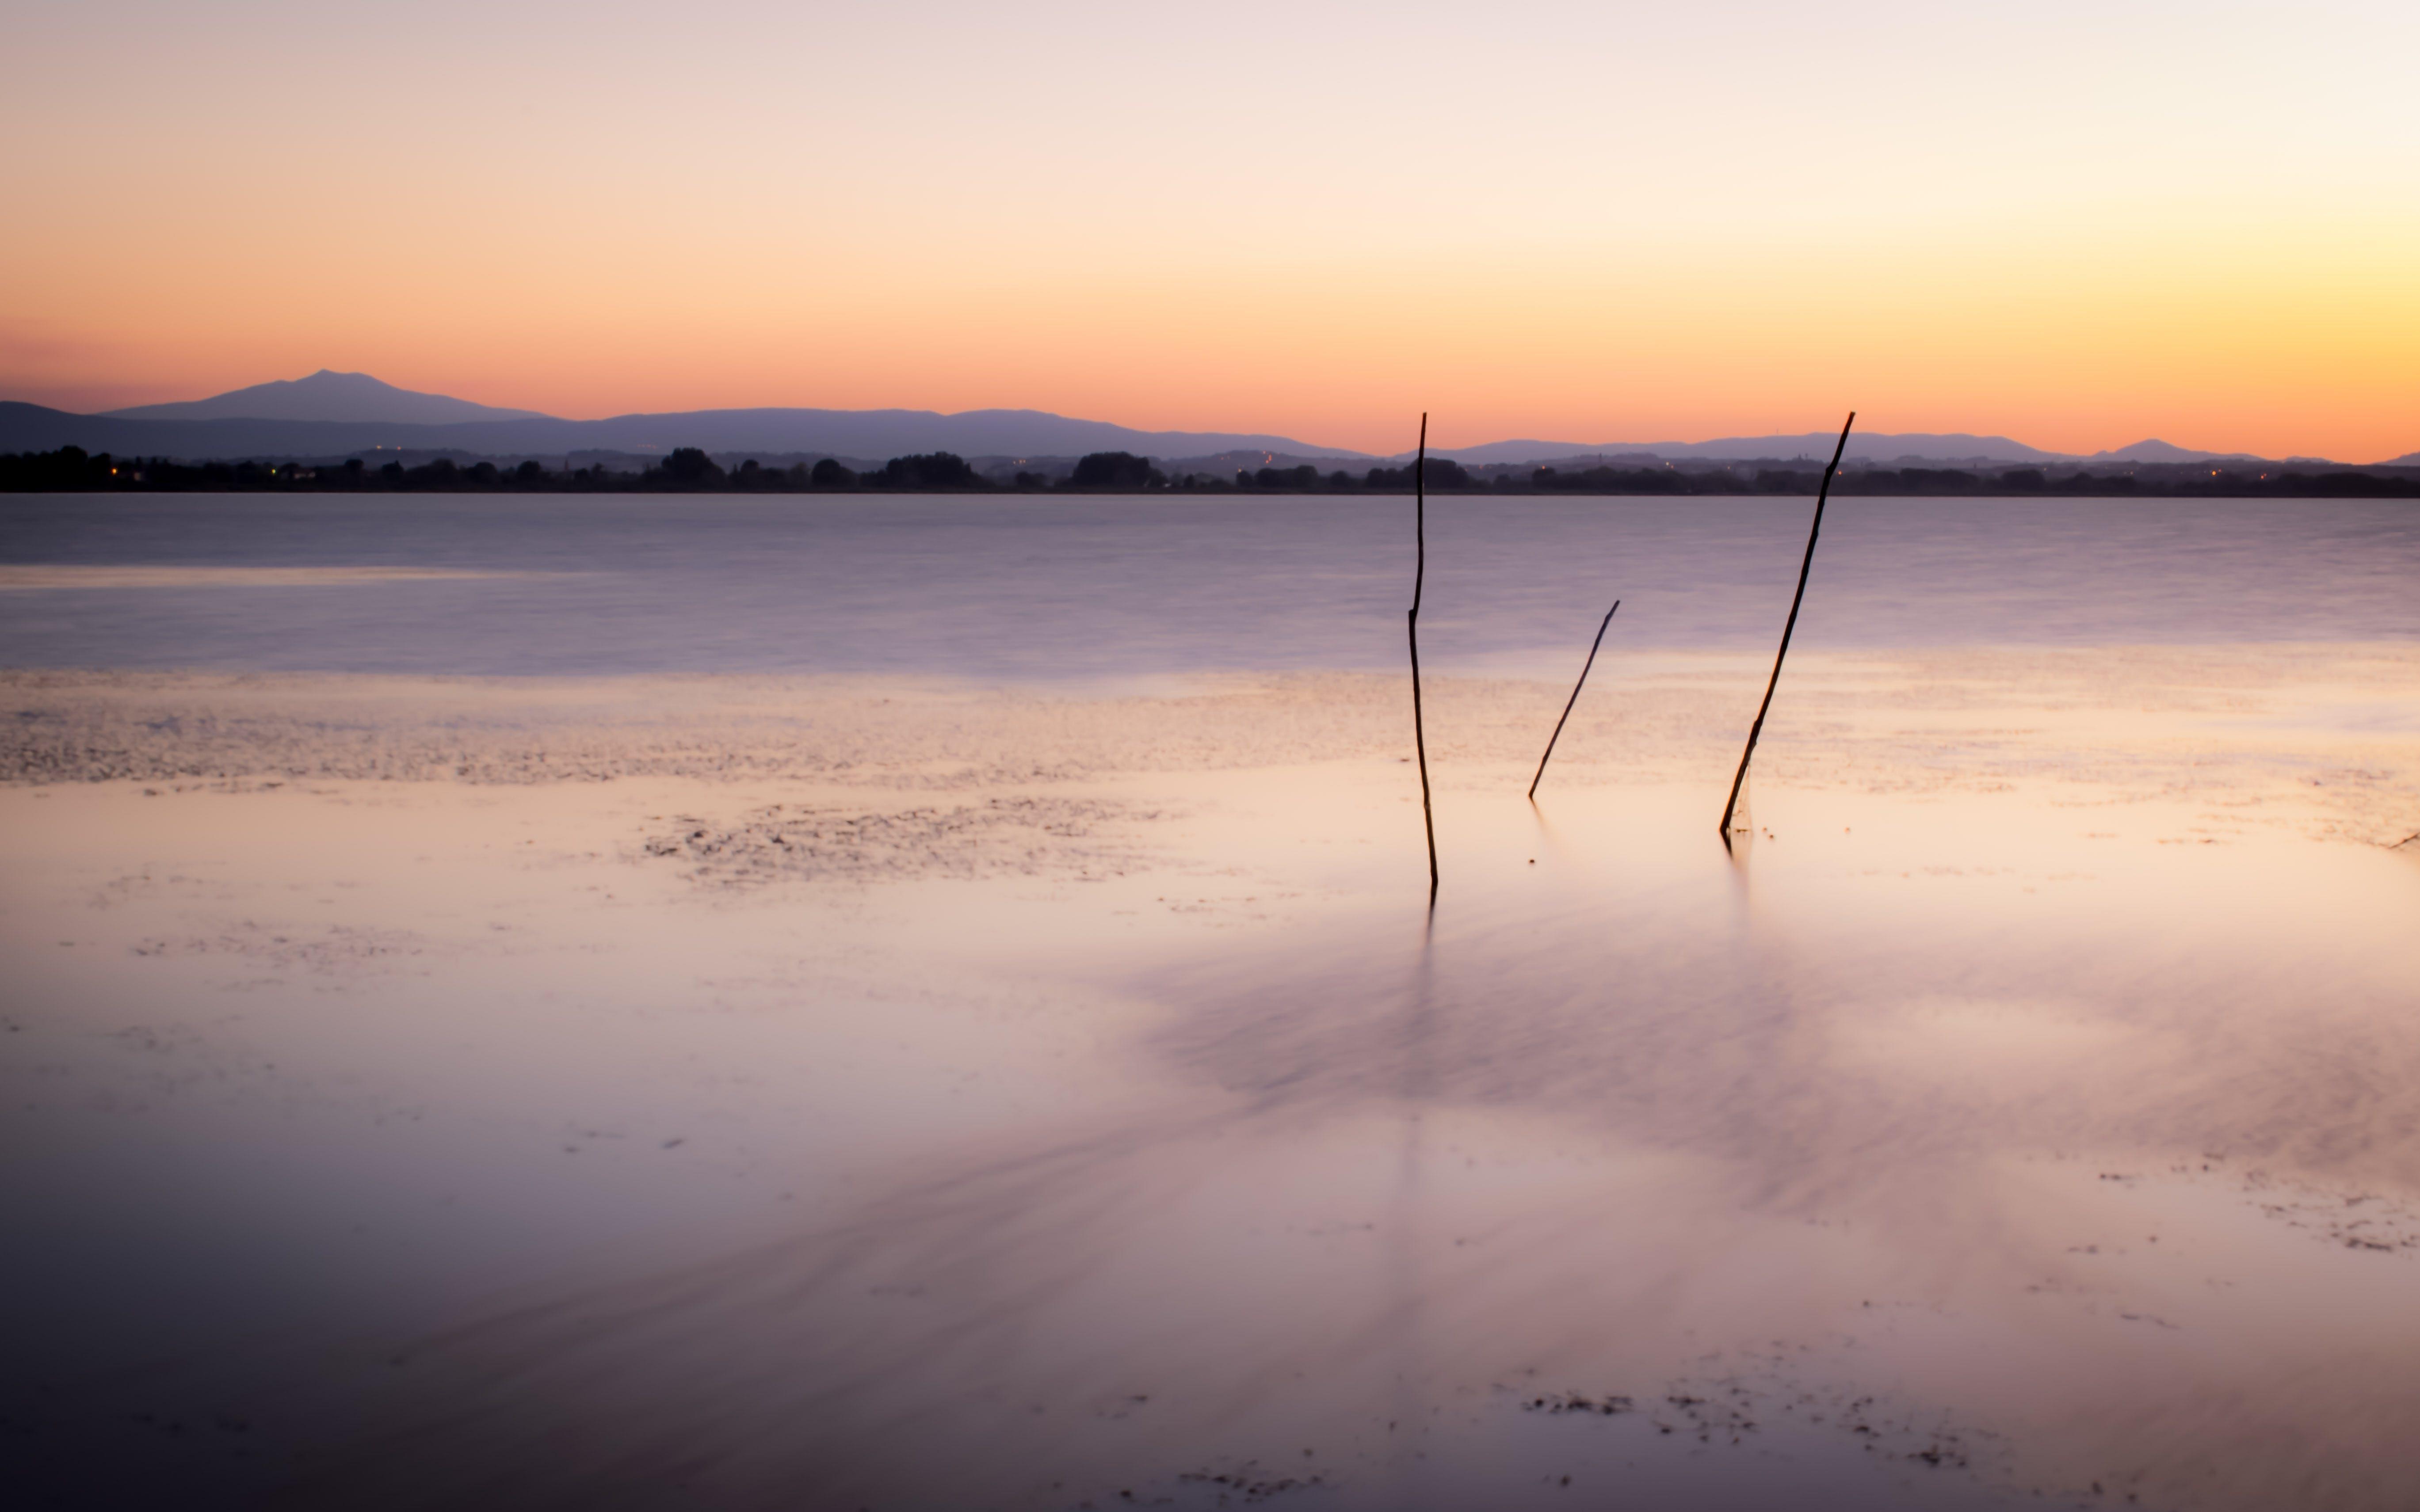 Free stock photo of calm waters, desktop wallpaper, golden sunset, lake